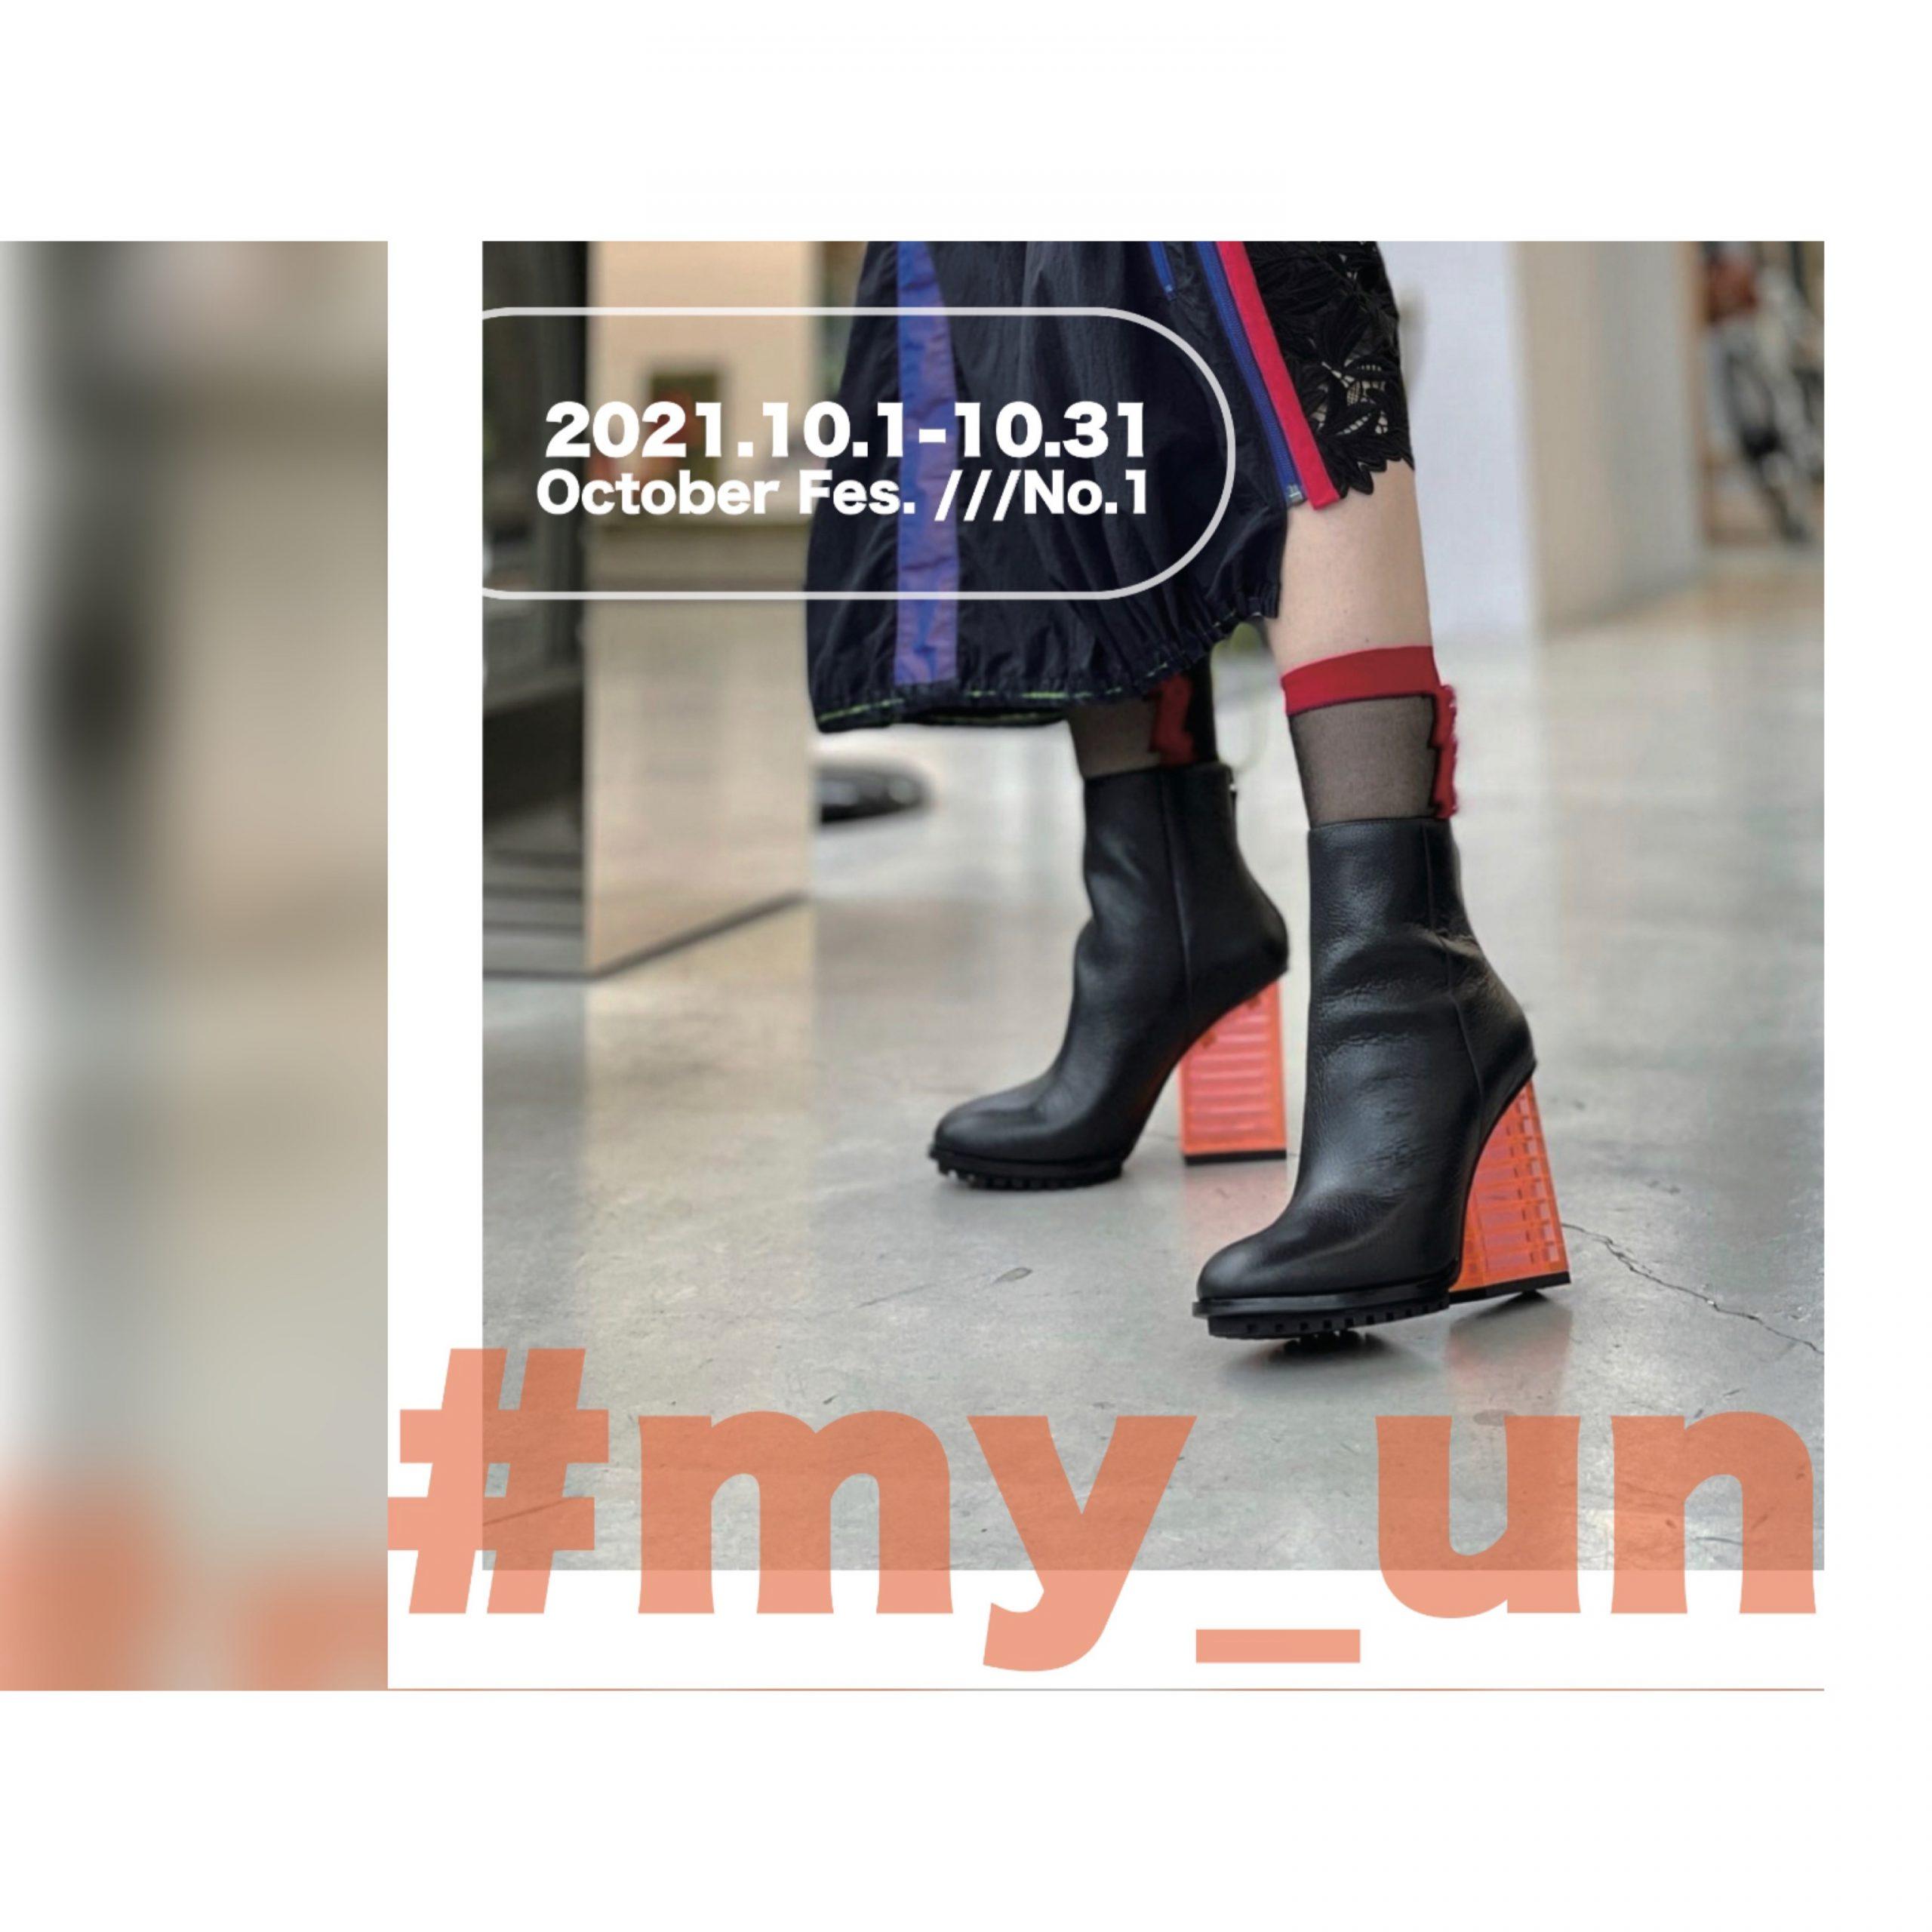 https://www.unitednudejapan.com/my_un-campaign/